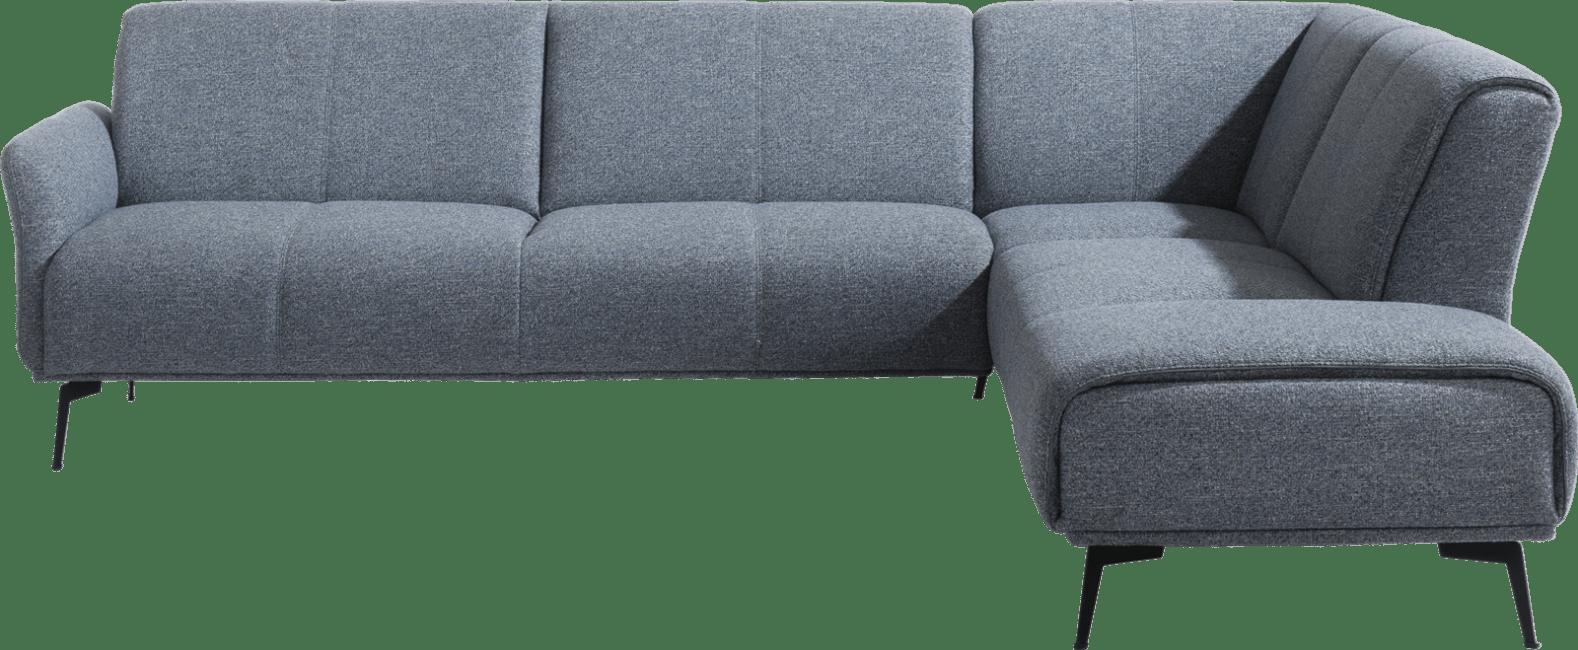 Manarola - 2.5-sitzer armlehne links